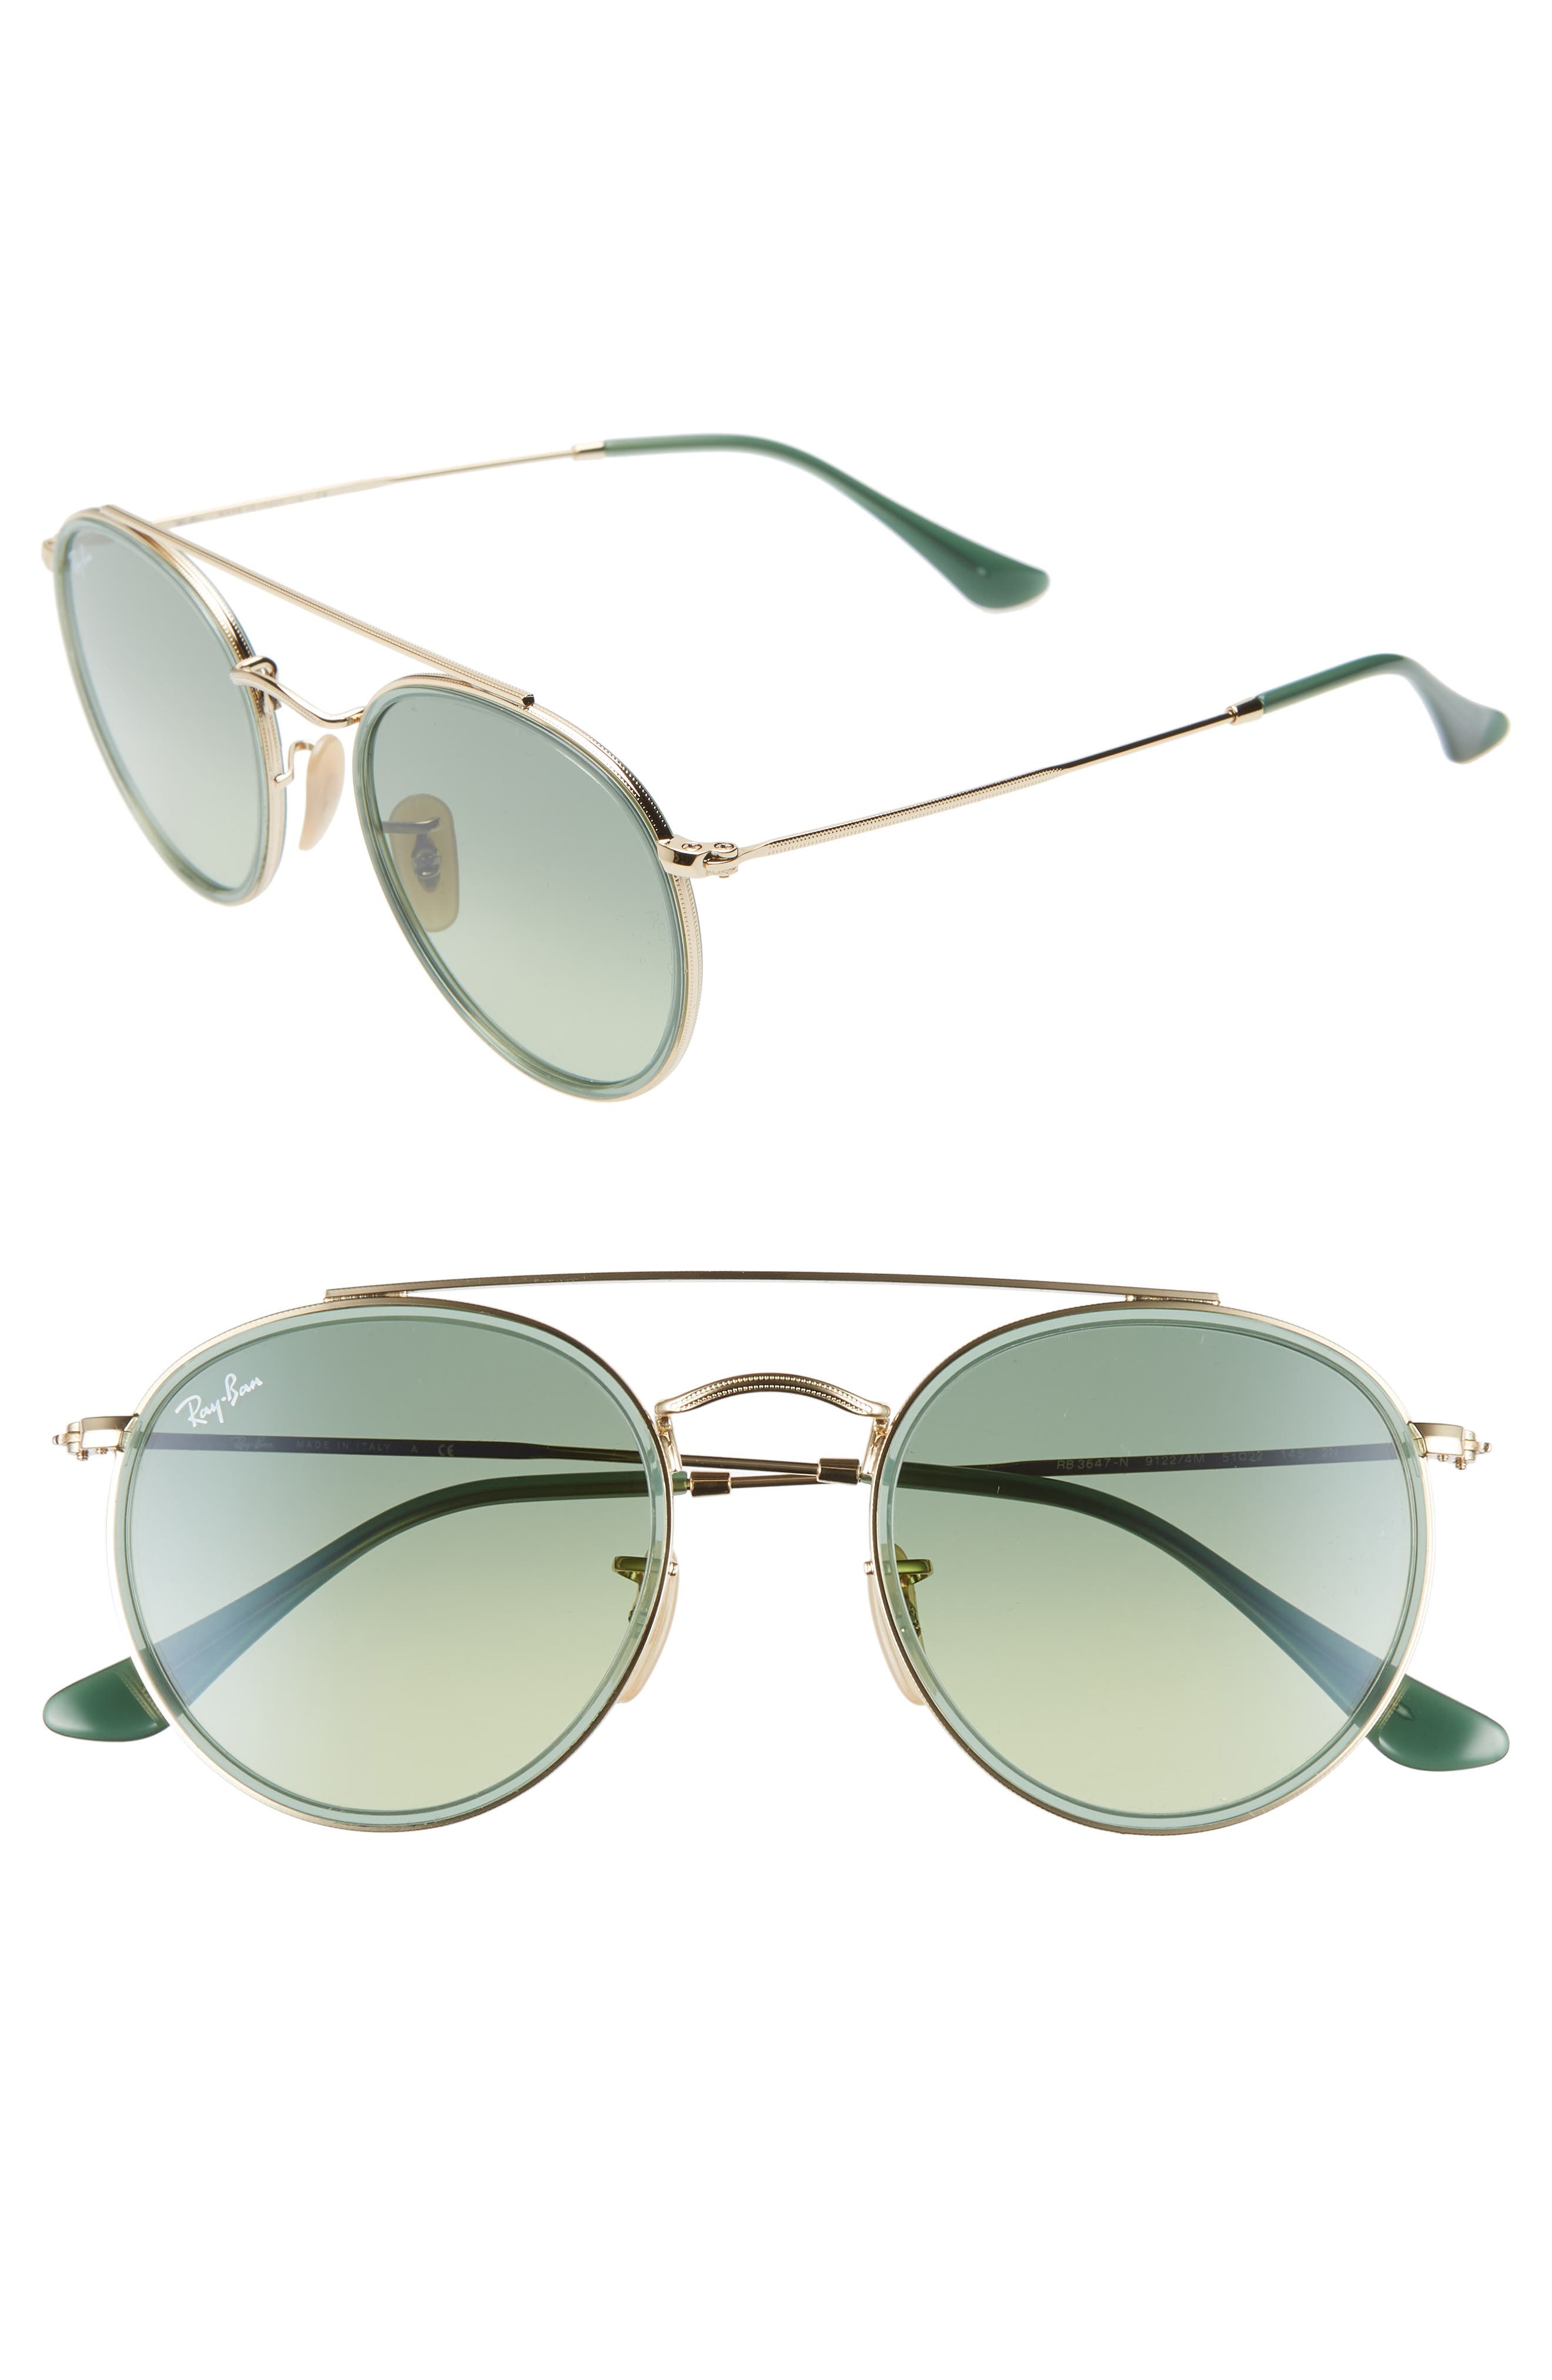 Ray-Ban 51Mm Aviator Gradient Lens Sunglasses - Gold/ Green Gradient